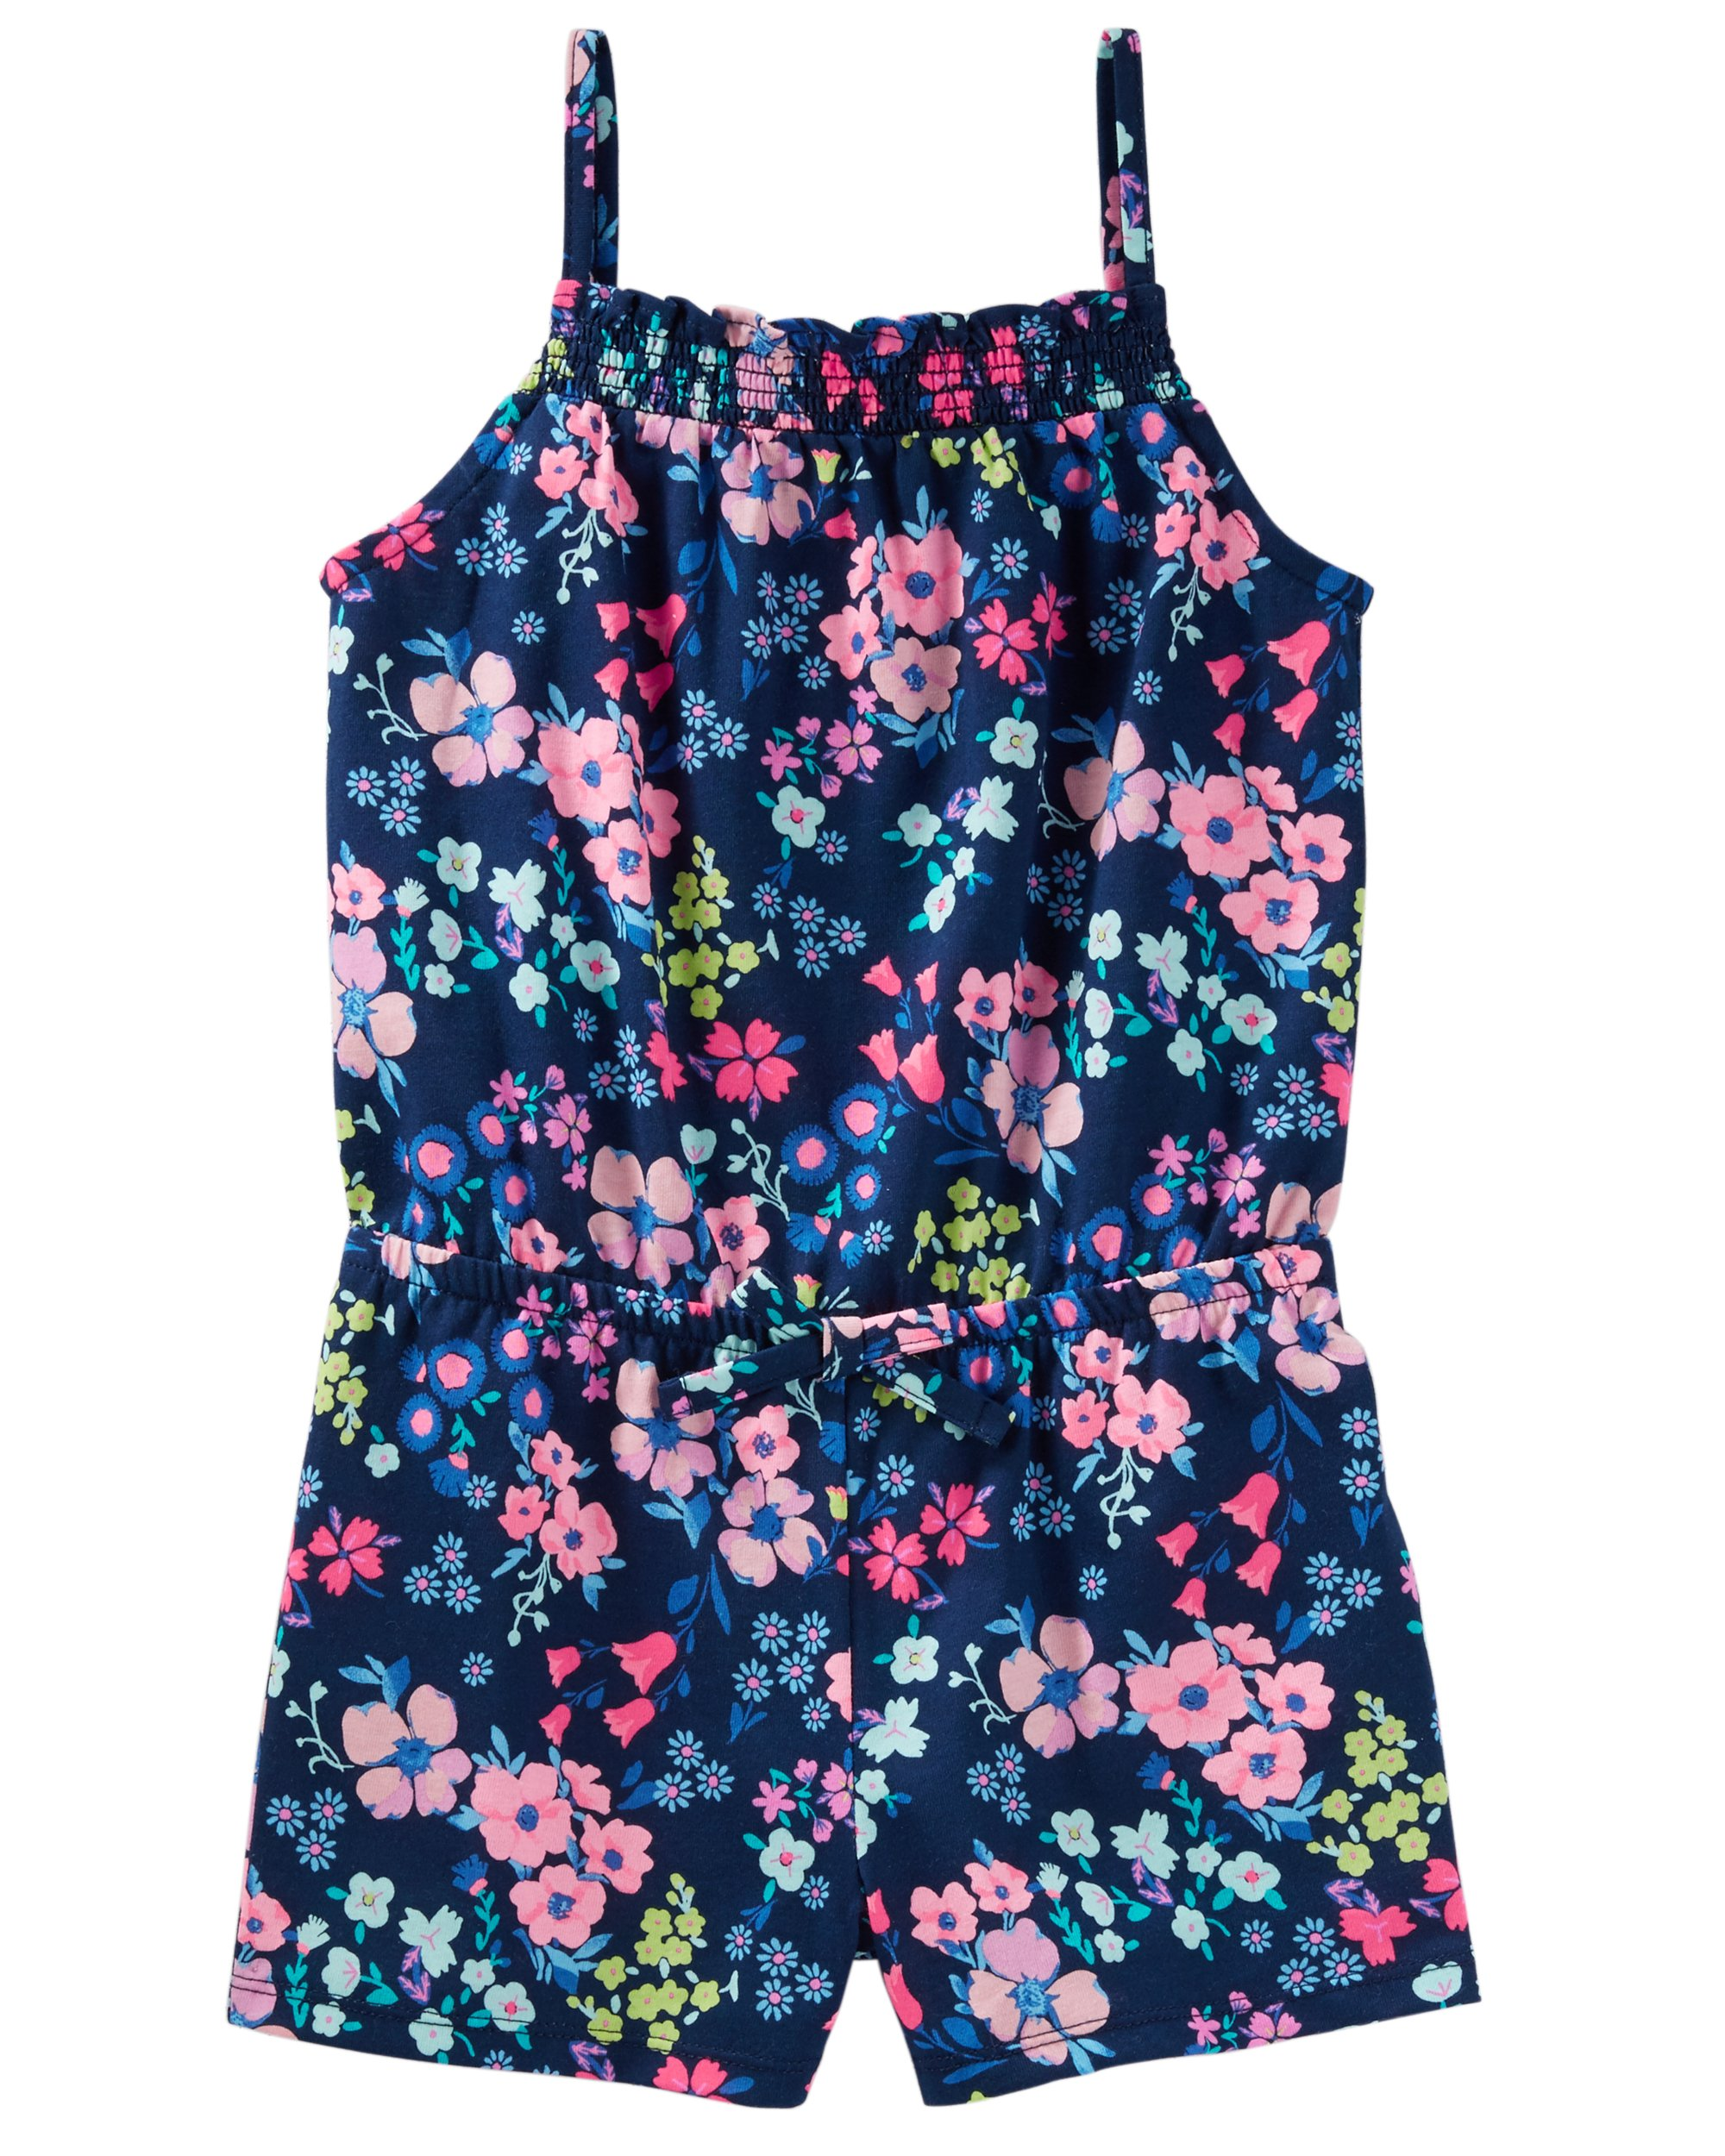 Osh Kosh Girls' Kids Sleeveless Romper, Navy Floral, 6-6X